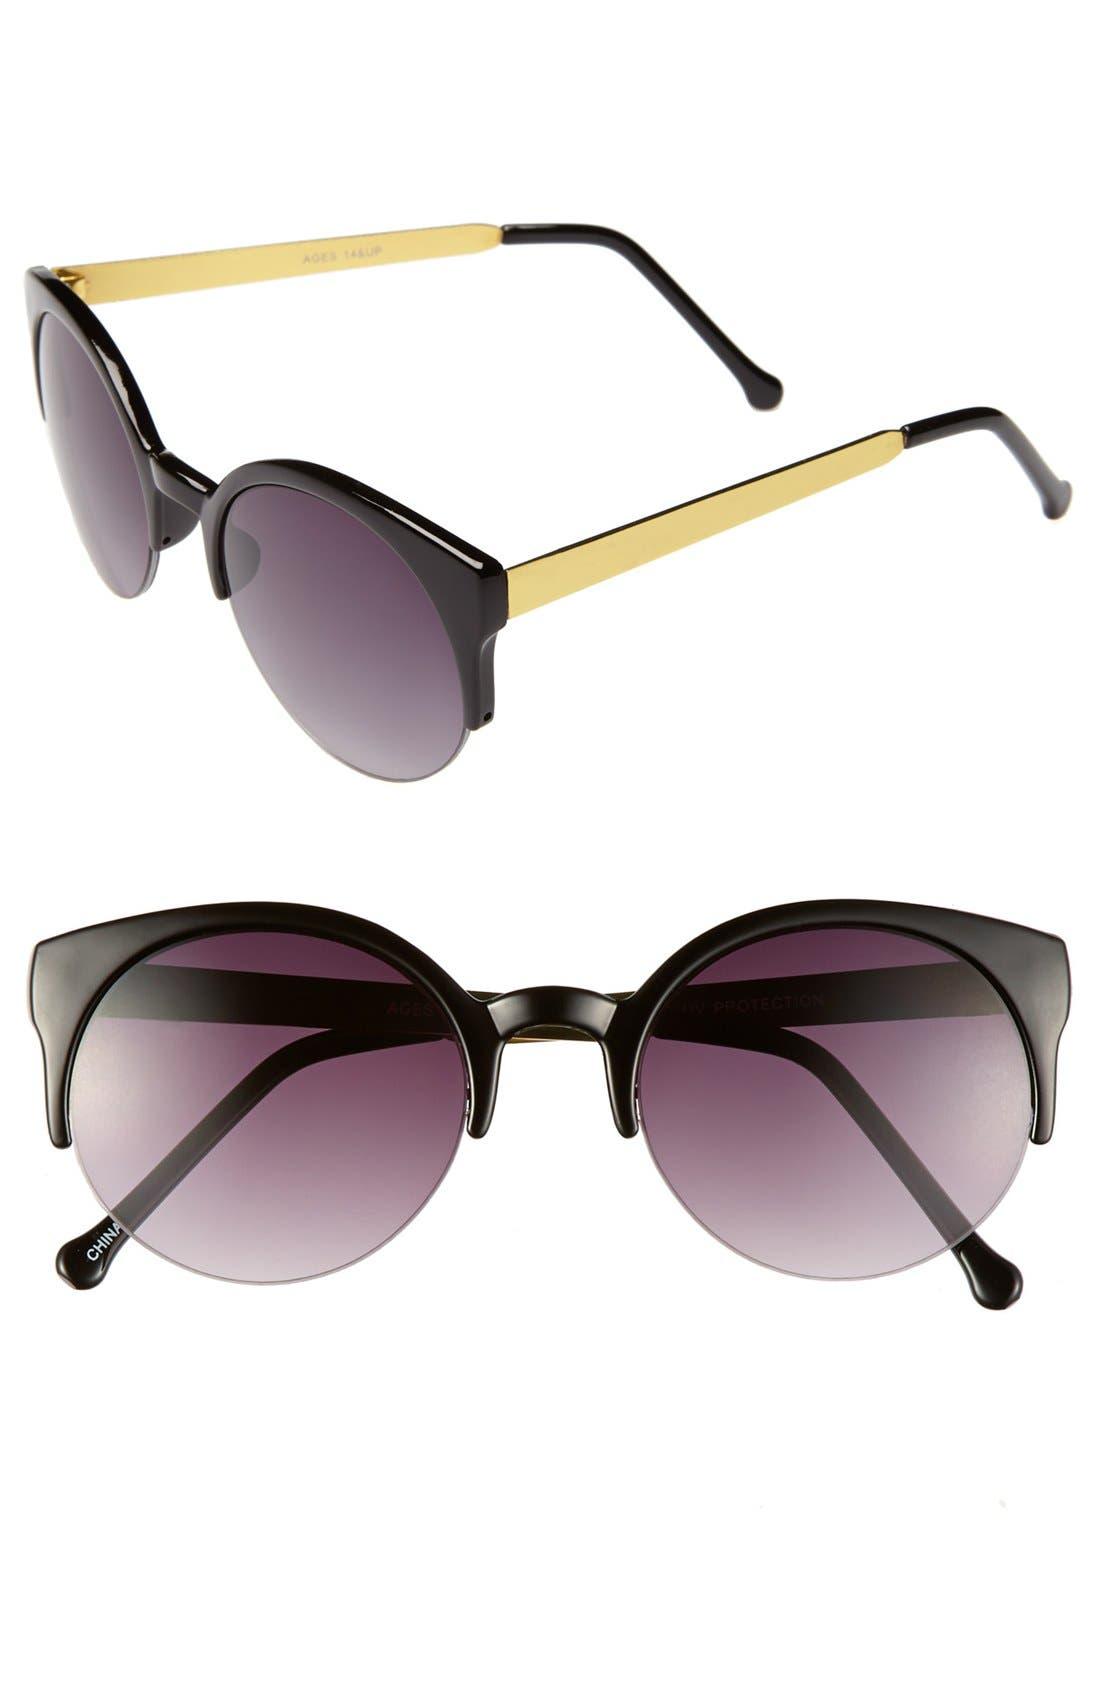 Alternate Image 1 Selected - FE NY 'Bridget' Sunglasses